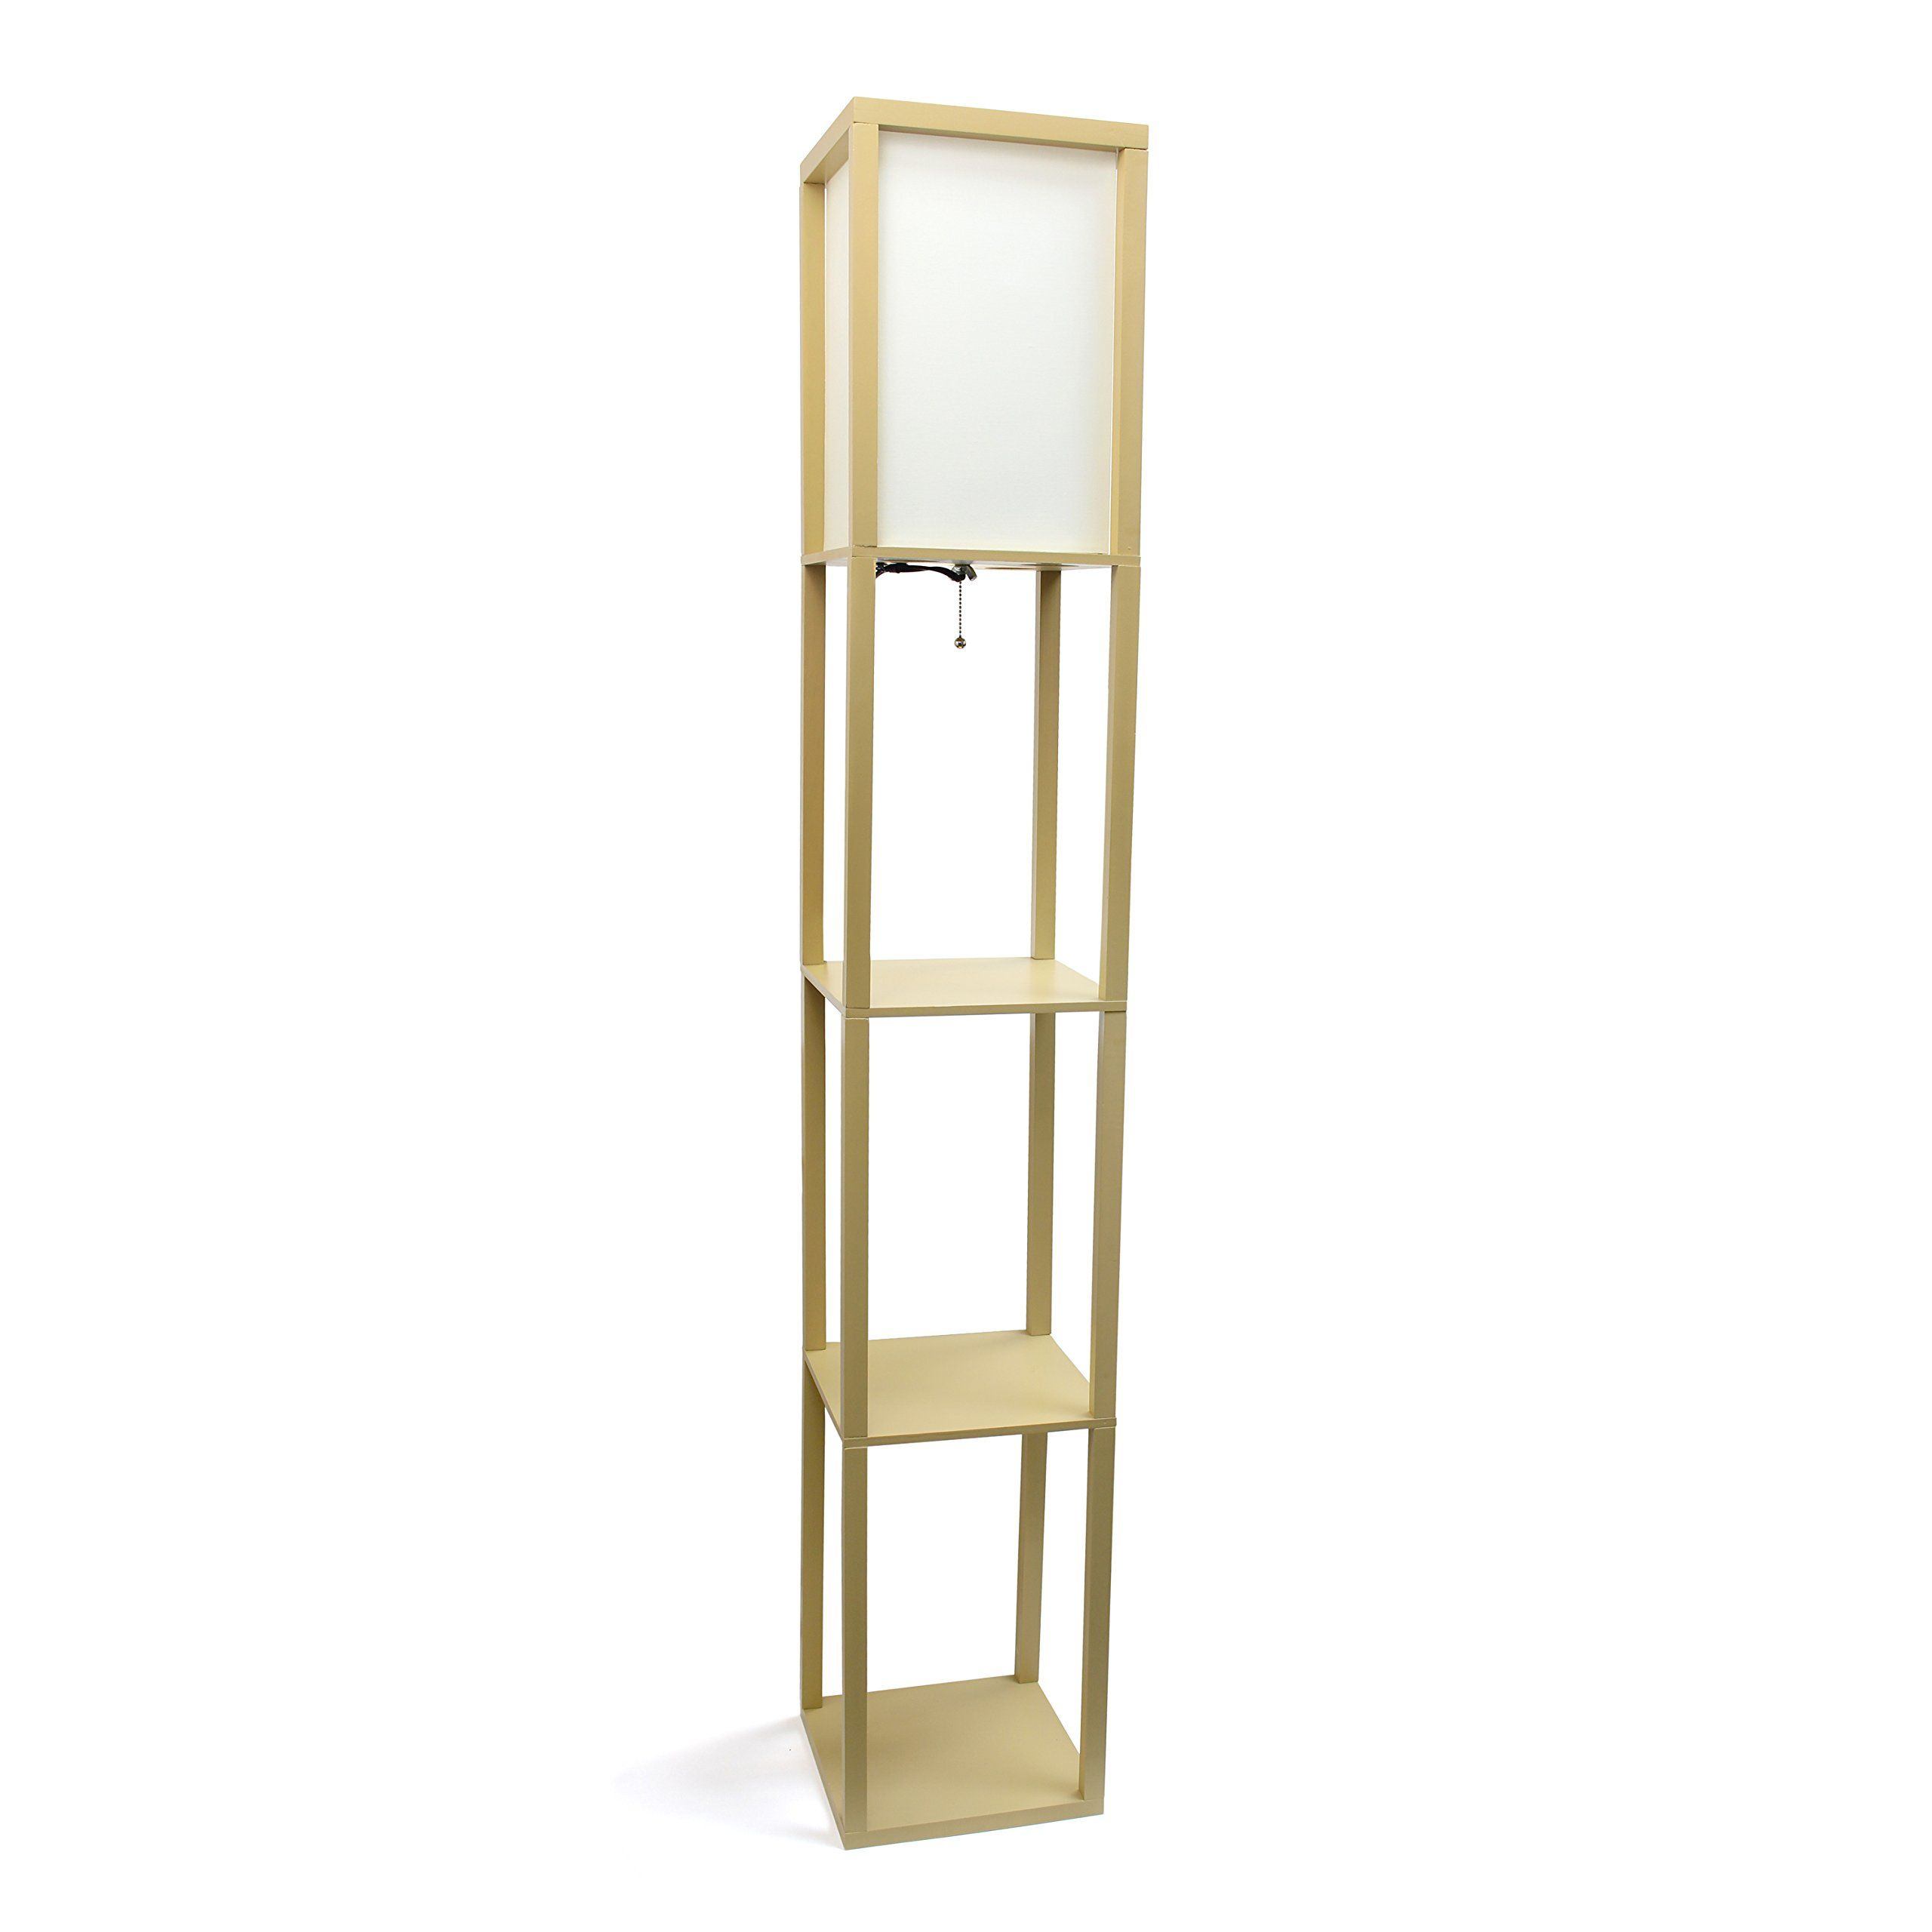 Simple Designs Home LF1014TAN Floor Lamp Organizer Storage